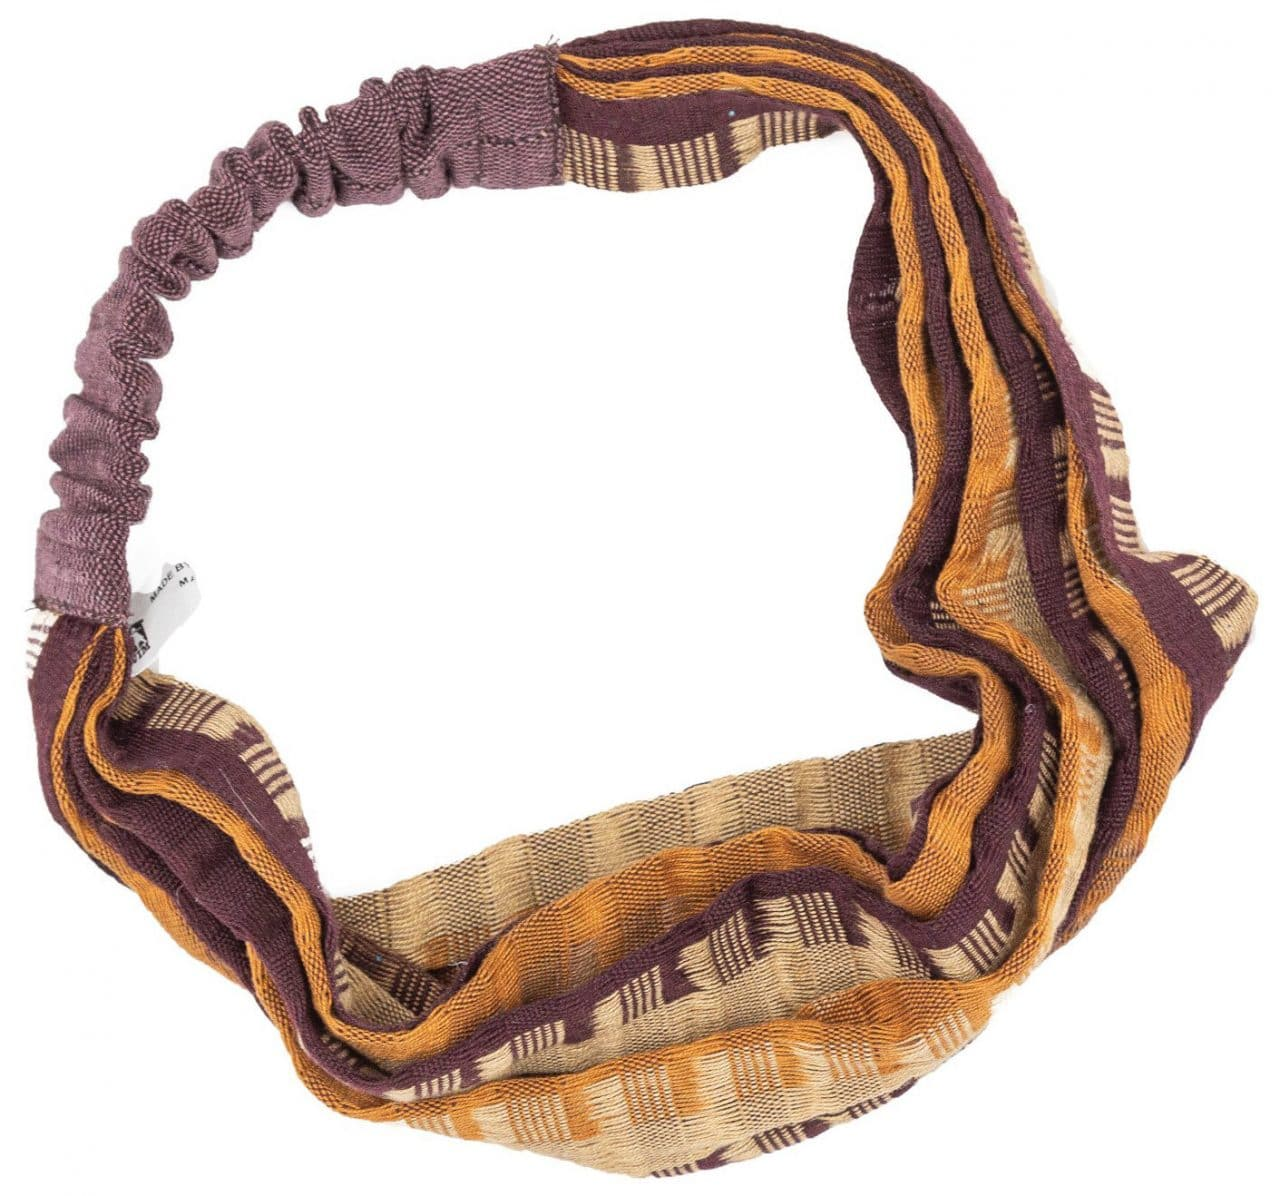 Guatemalan Woven Headband - A Variety of Colors